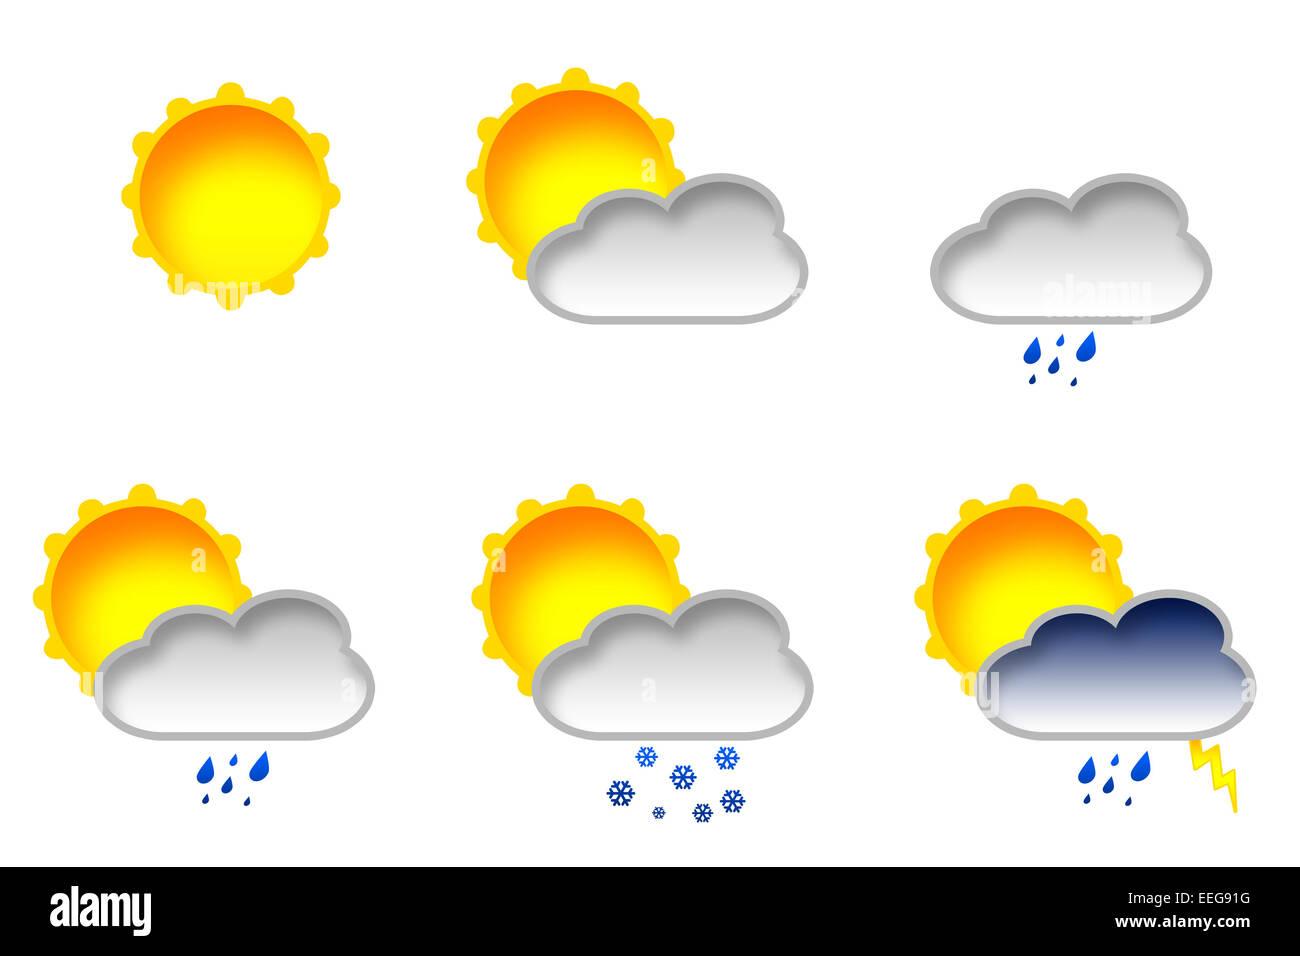 Weather Icon - sun, cloud and rain - Stock Image